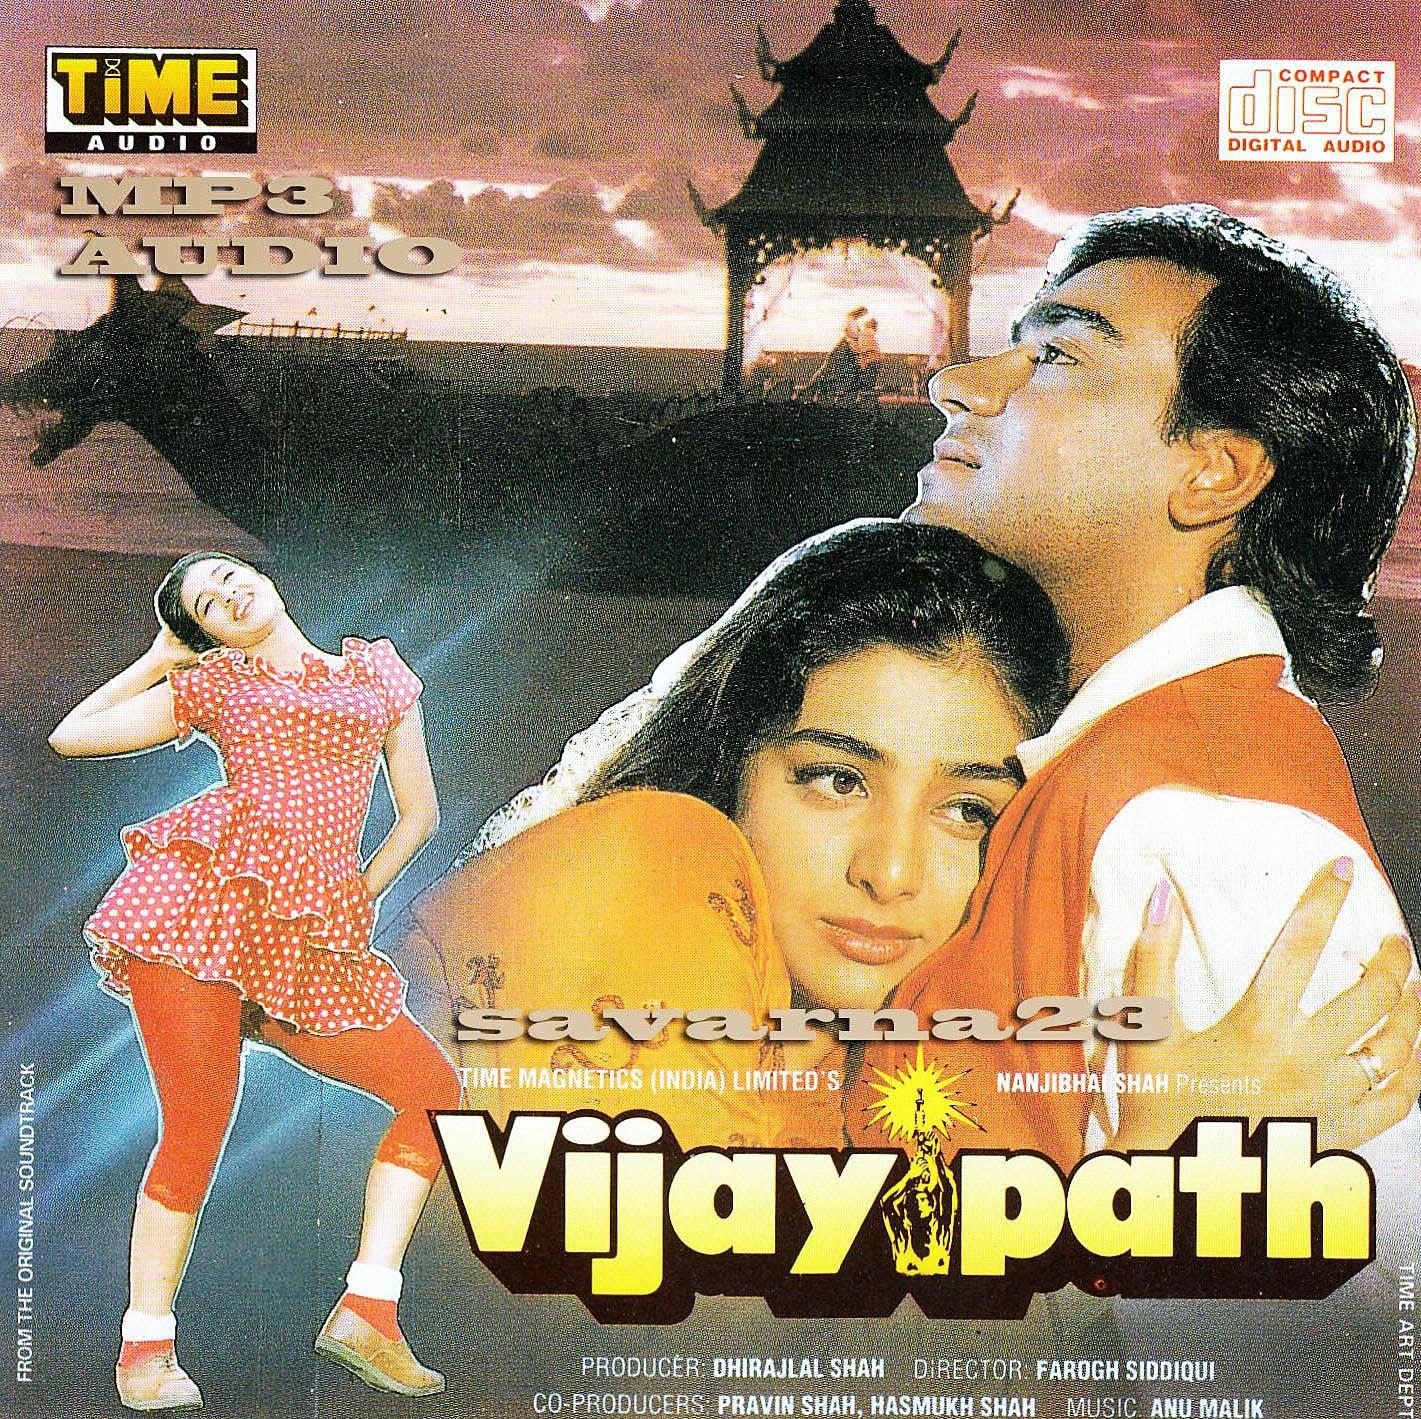 Vijaypath (1994) Hindi Full Movie Watch Online *BluRay*